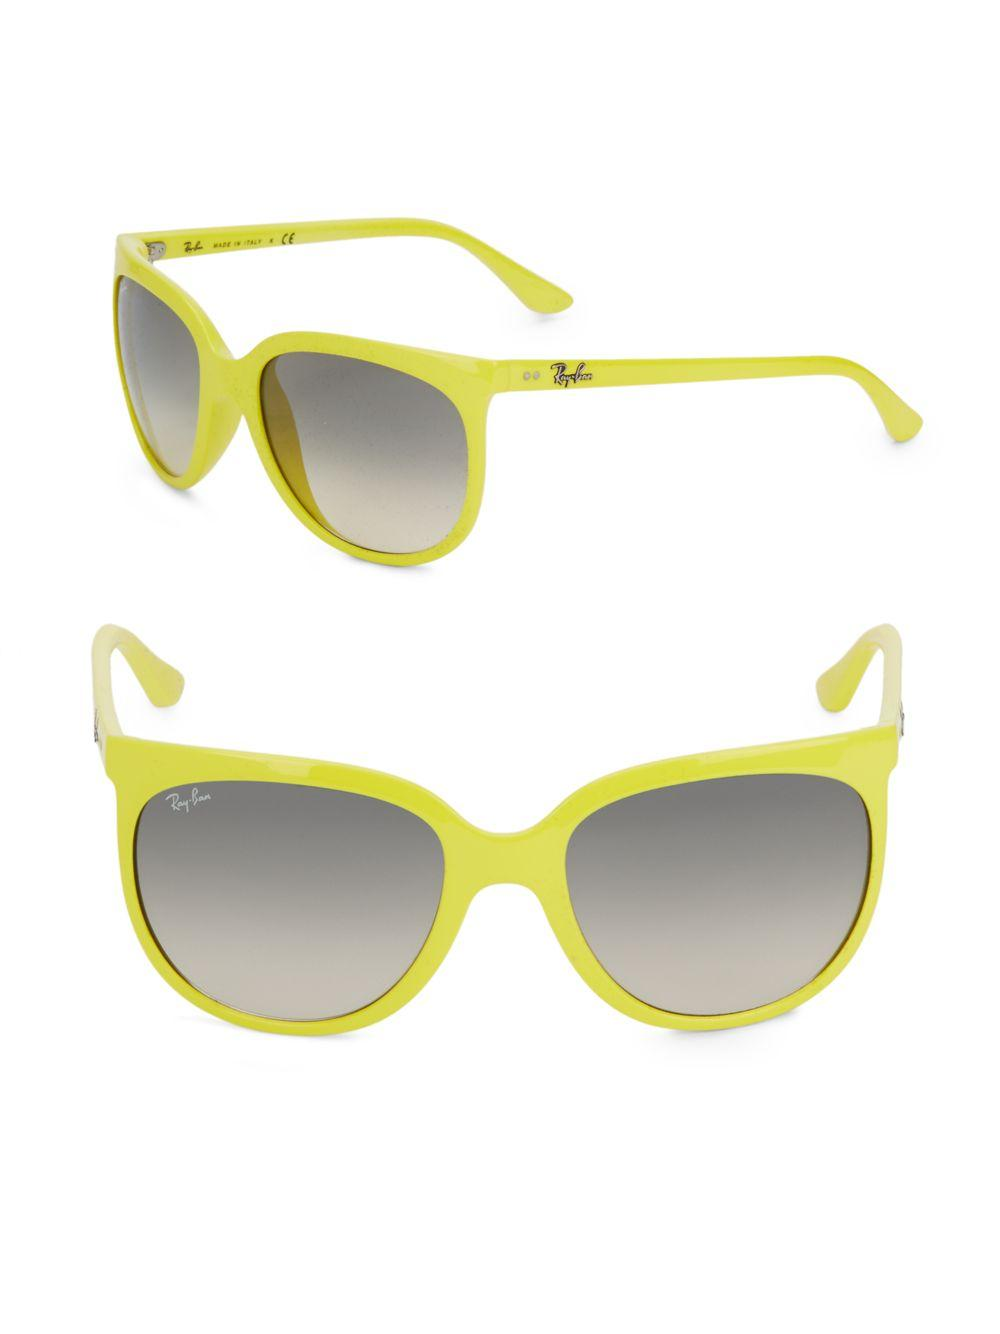 94dbfa998672 Cheap Ray Ban Cats Yellow. Ray-ban Cats Wayfarer Sunglasses ...